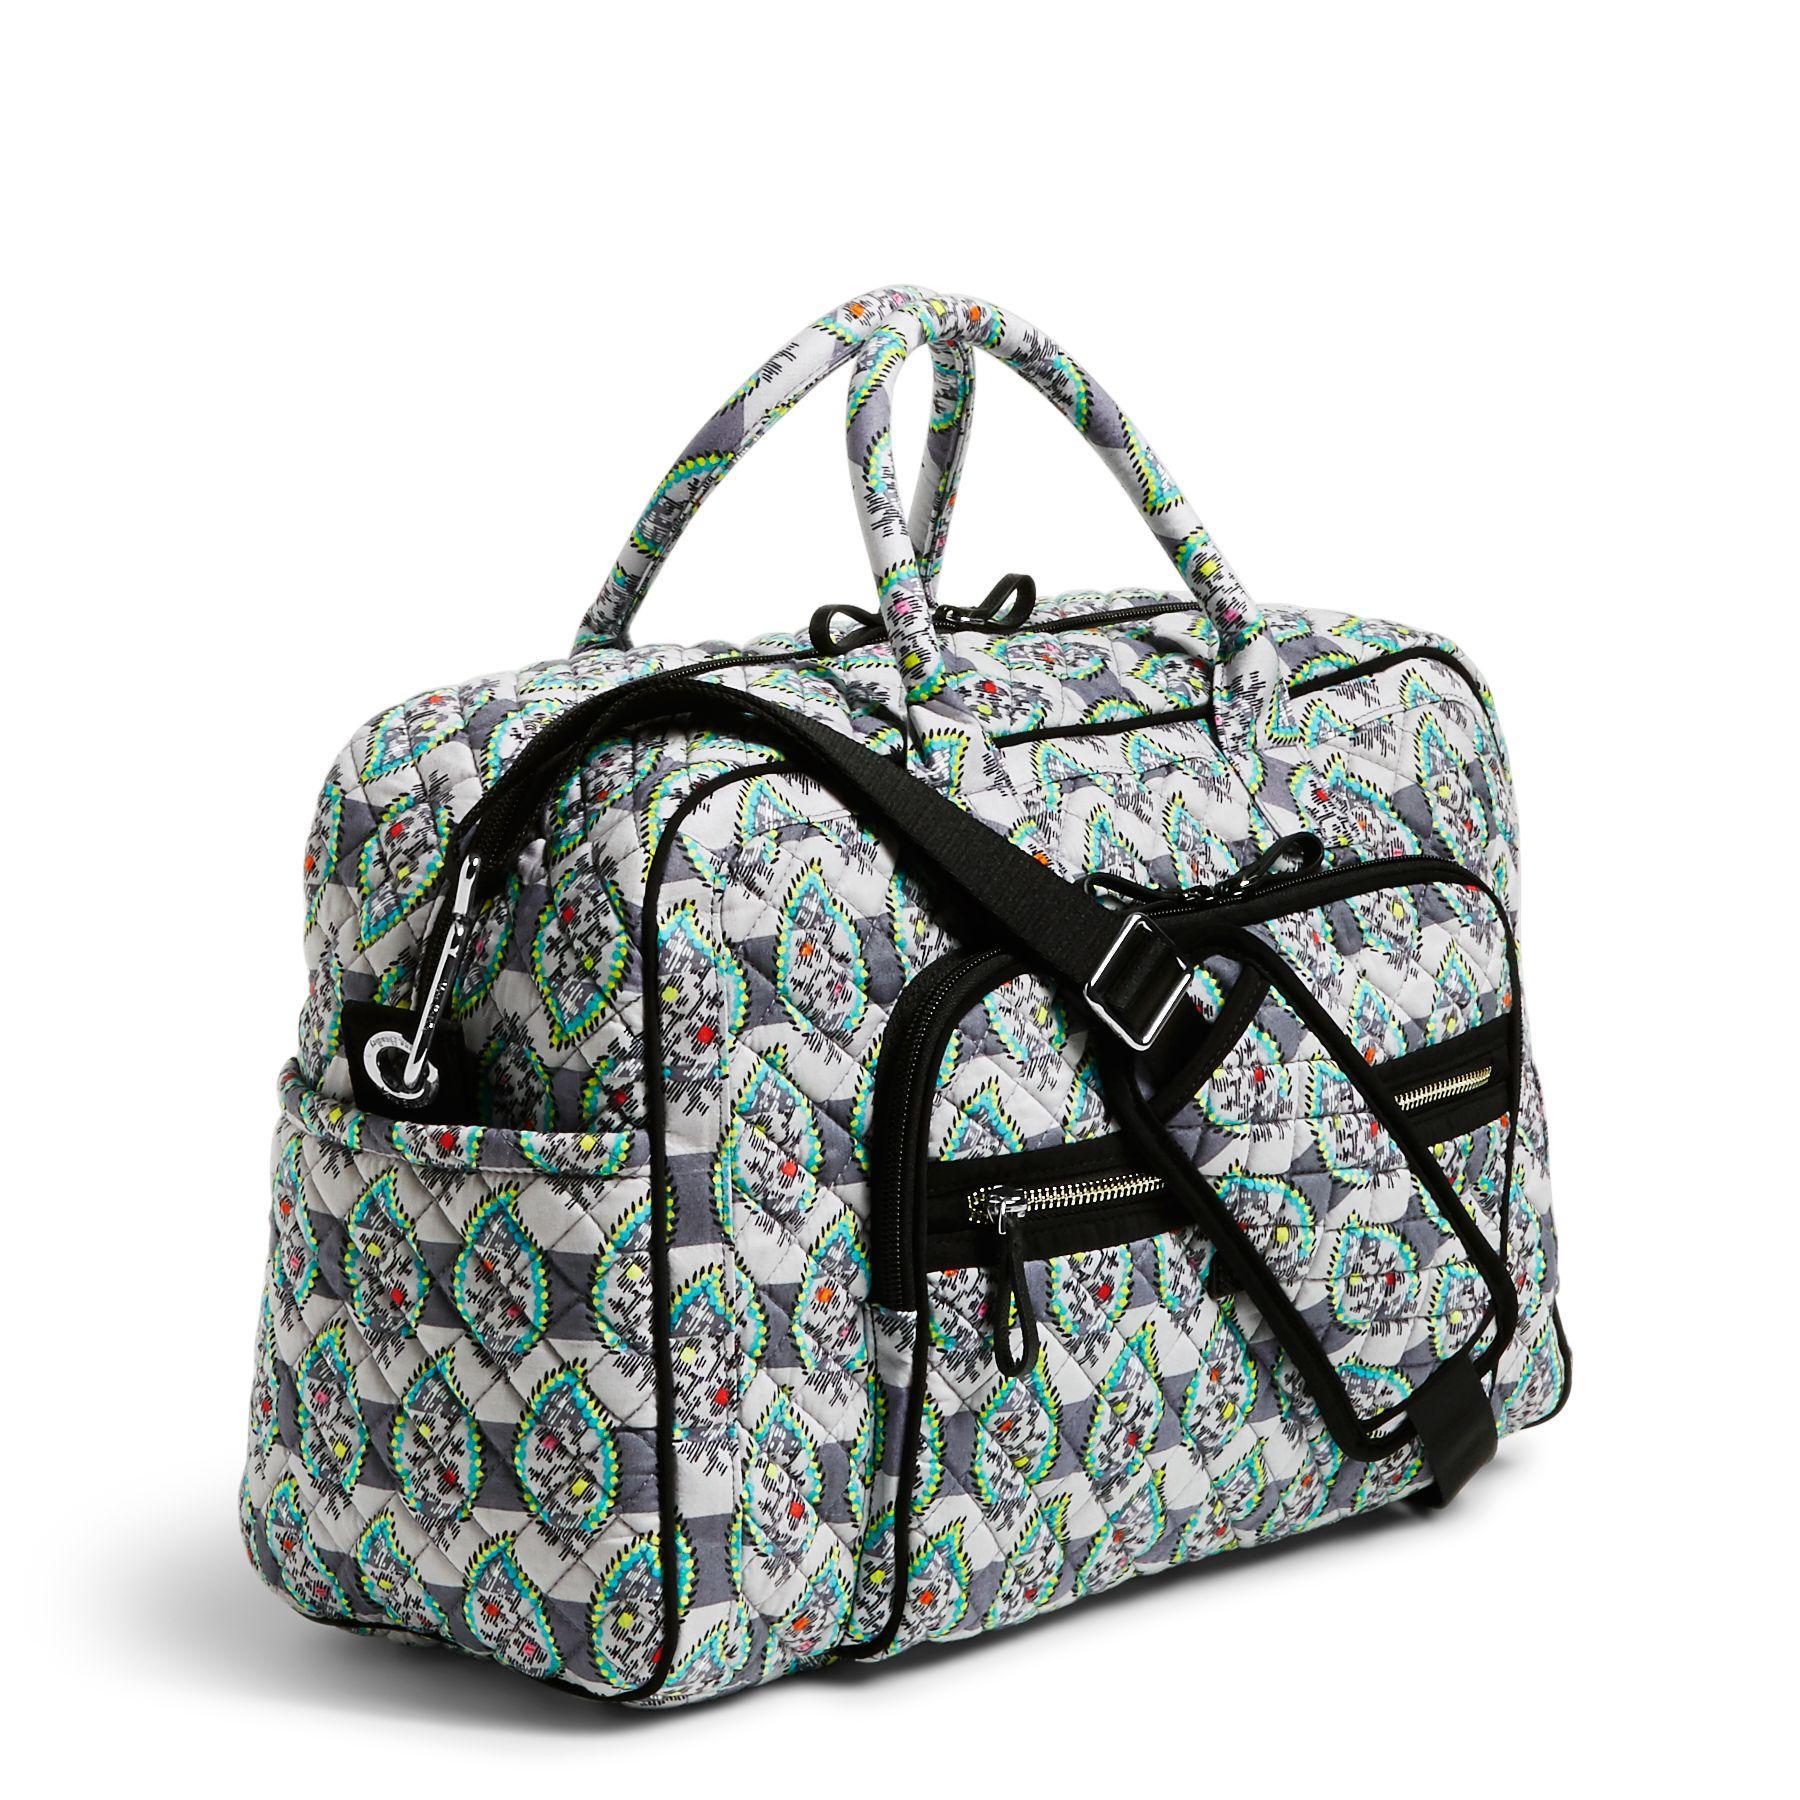 c4447d7e1 Vera Bradley Iconic Compact Weekender Travel Bag - Lyst